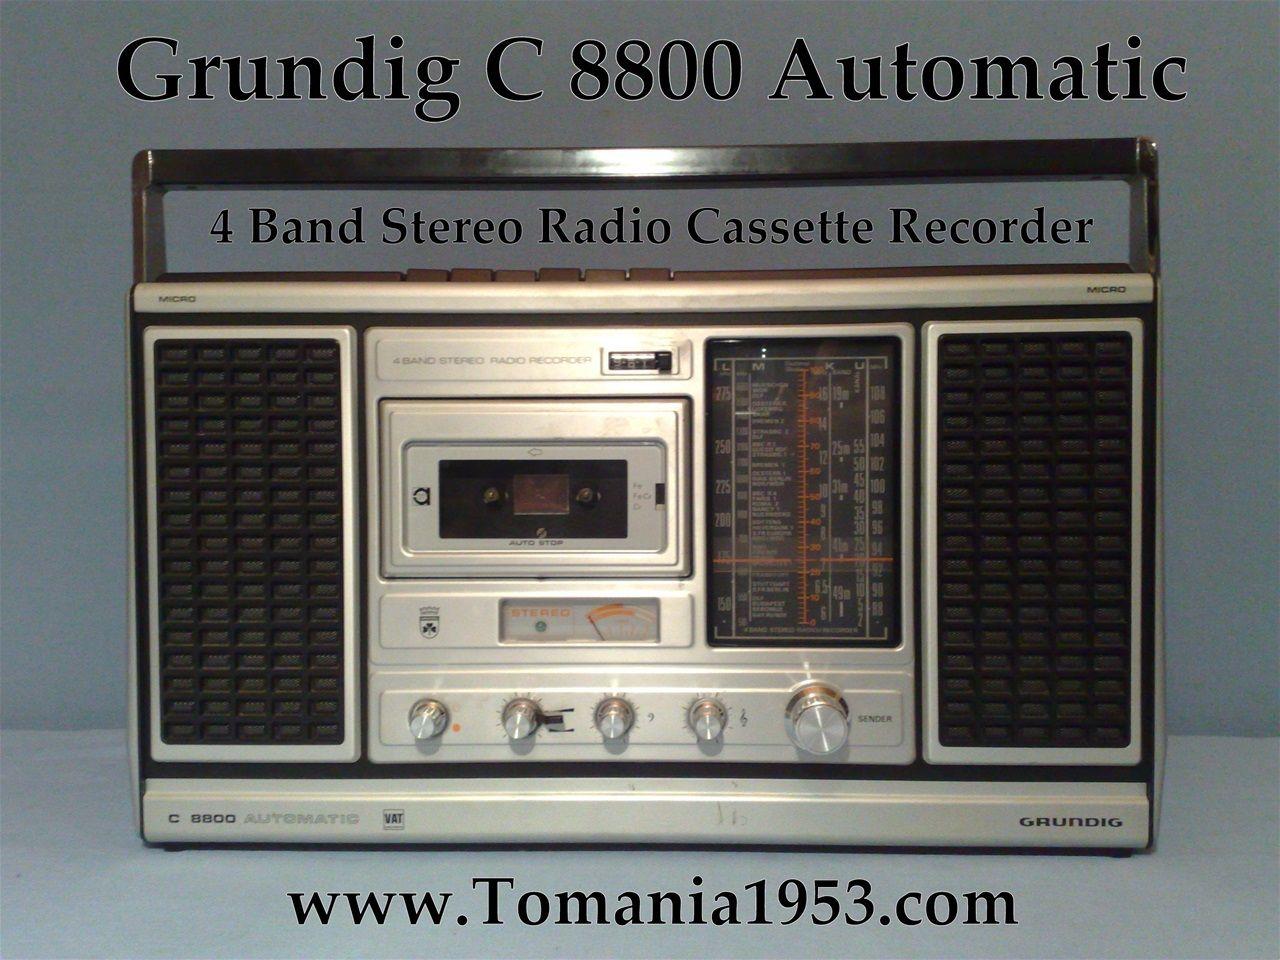 Grundig Radioes - www.tomania1953.com